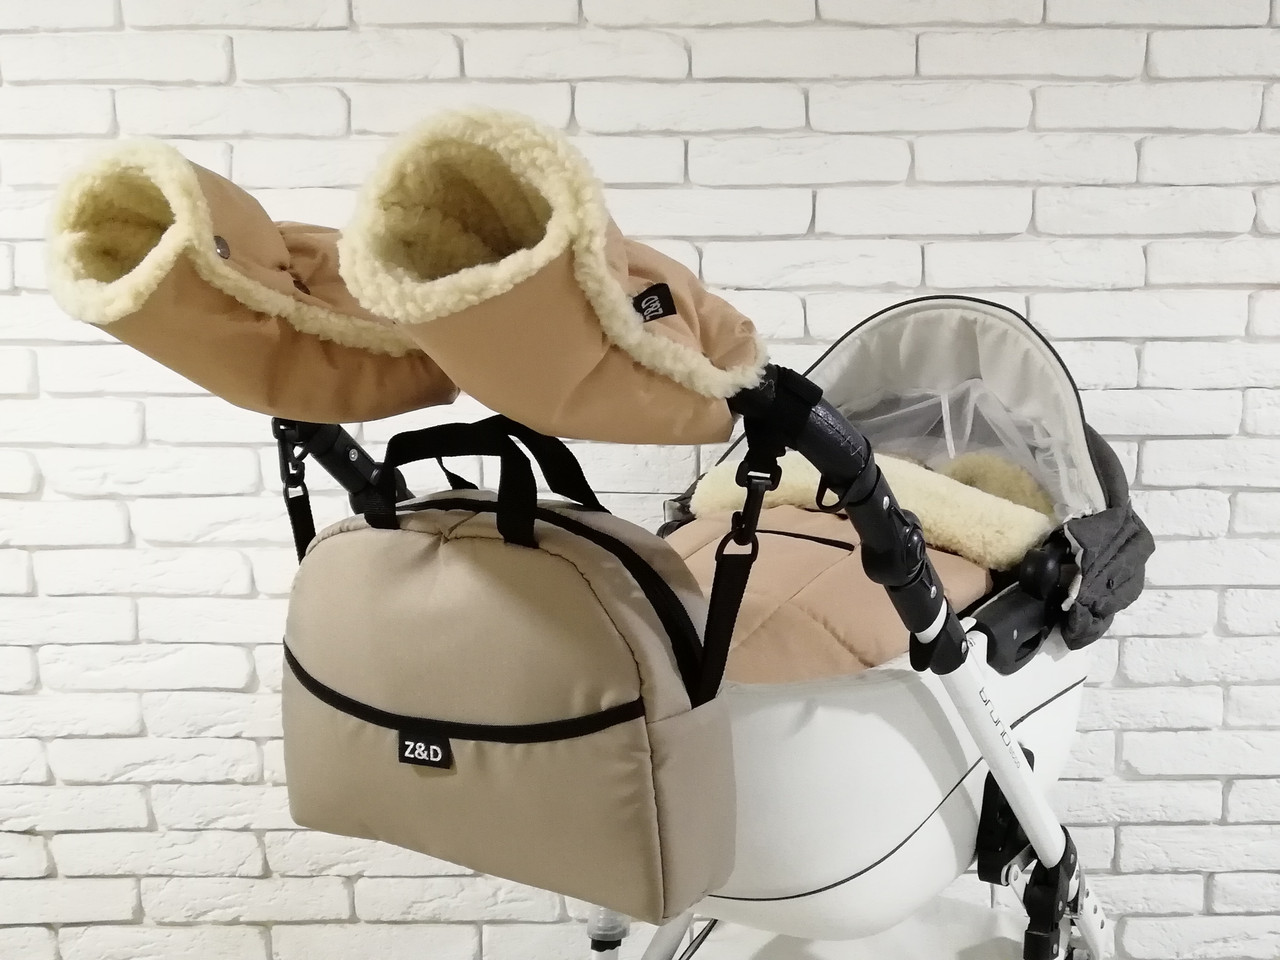 Комплект зимний Конверт, рукавички и сумка Z&D New (Бежевый)